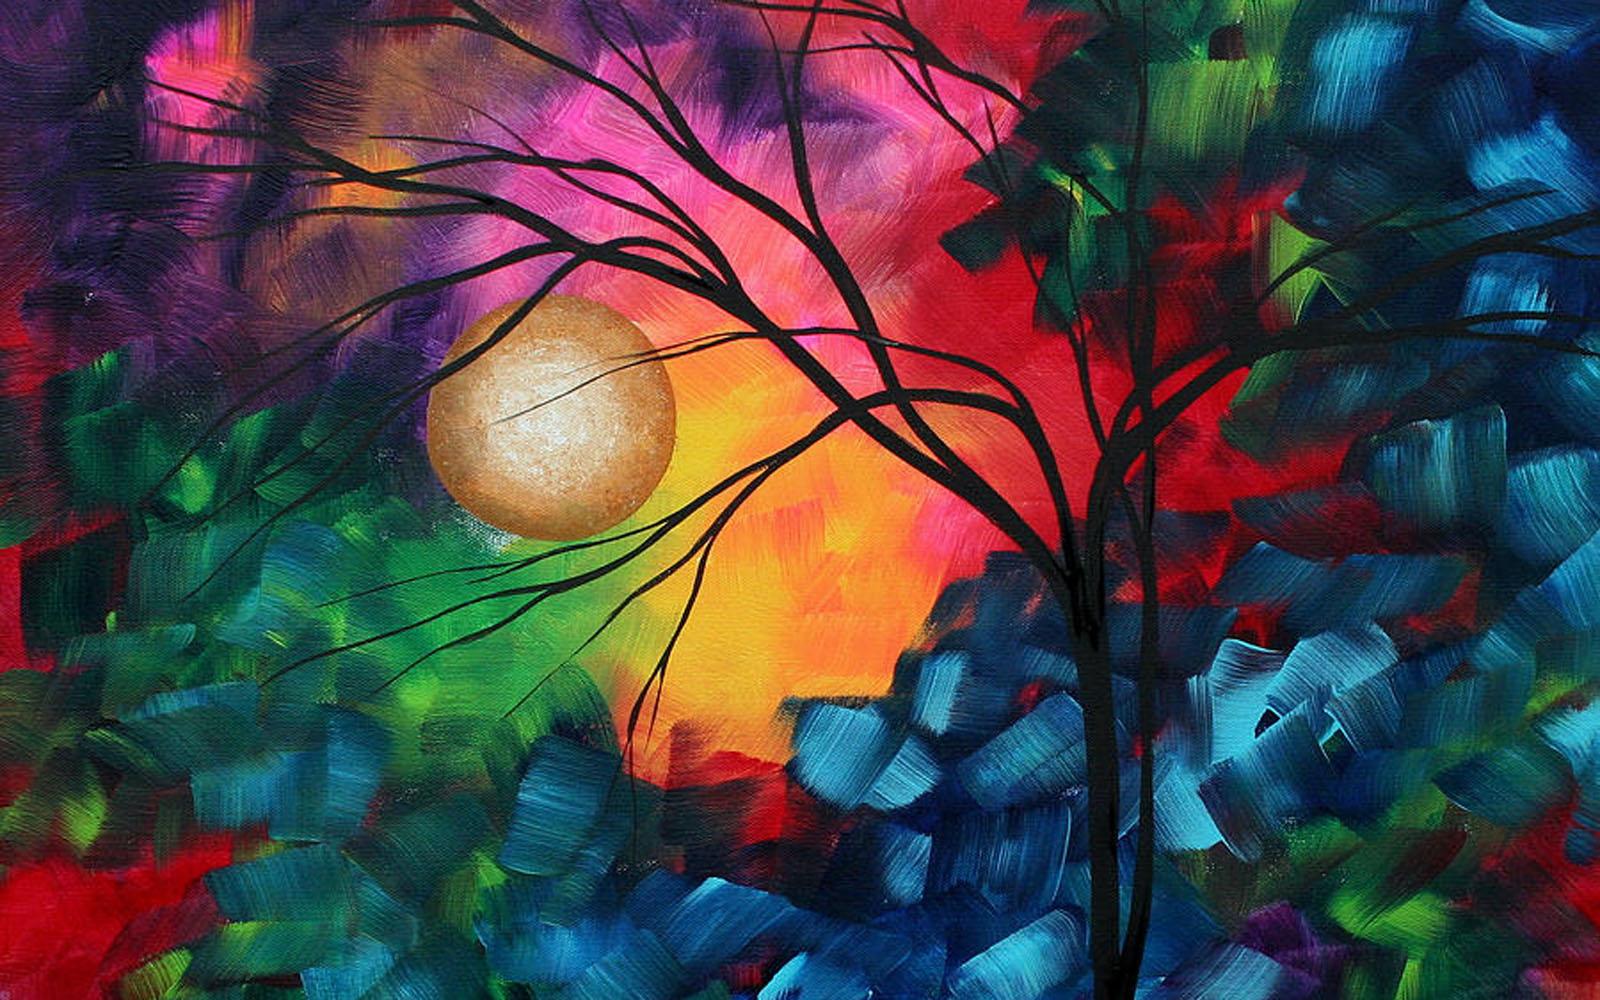 Sachin Tendulkar Hd Wallpapers For Laptop Wallpapers Colorful Paintings Wallpapers